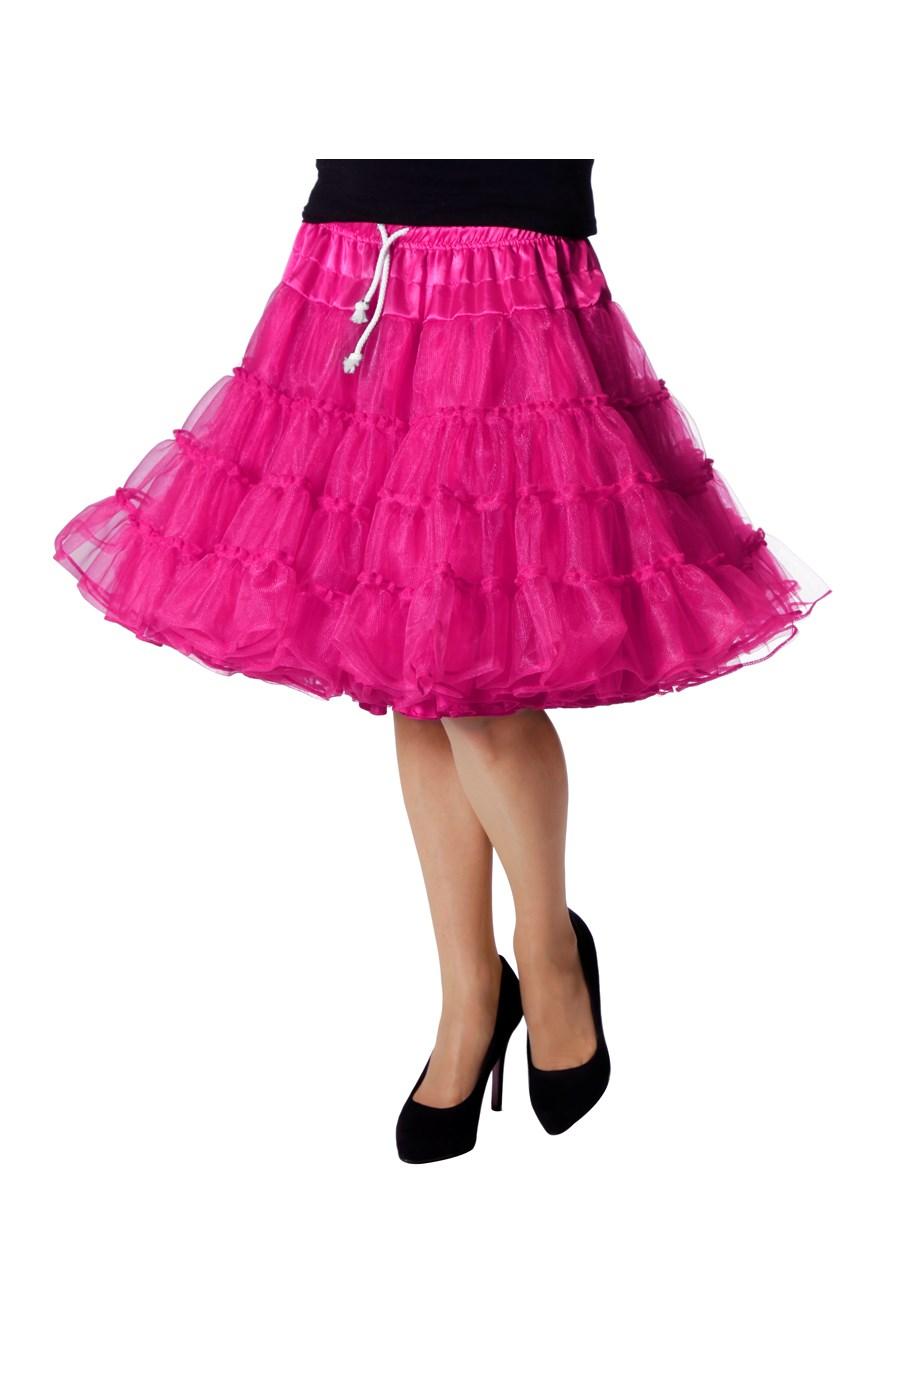 Petticoat luxe pink-0